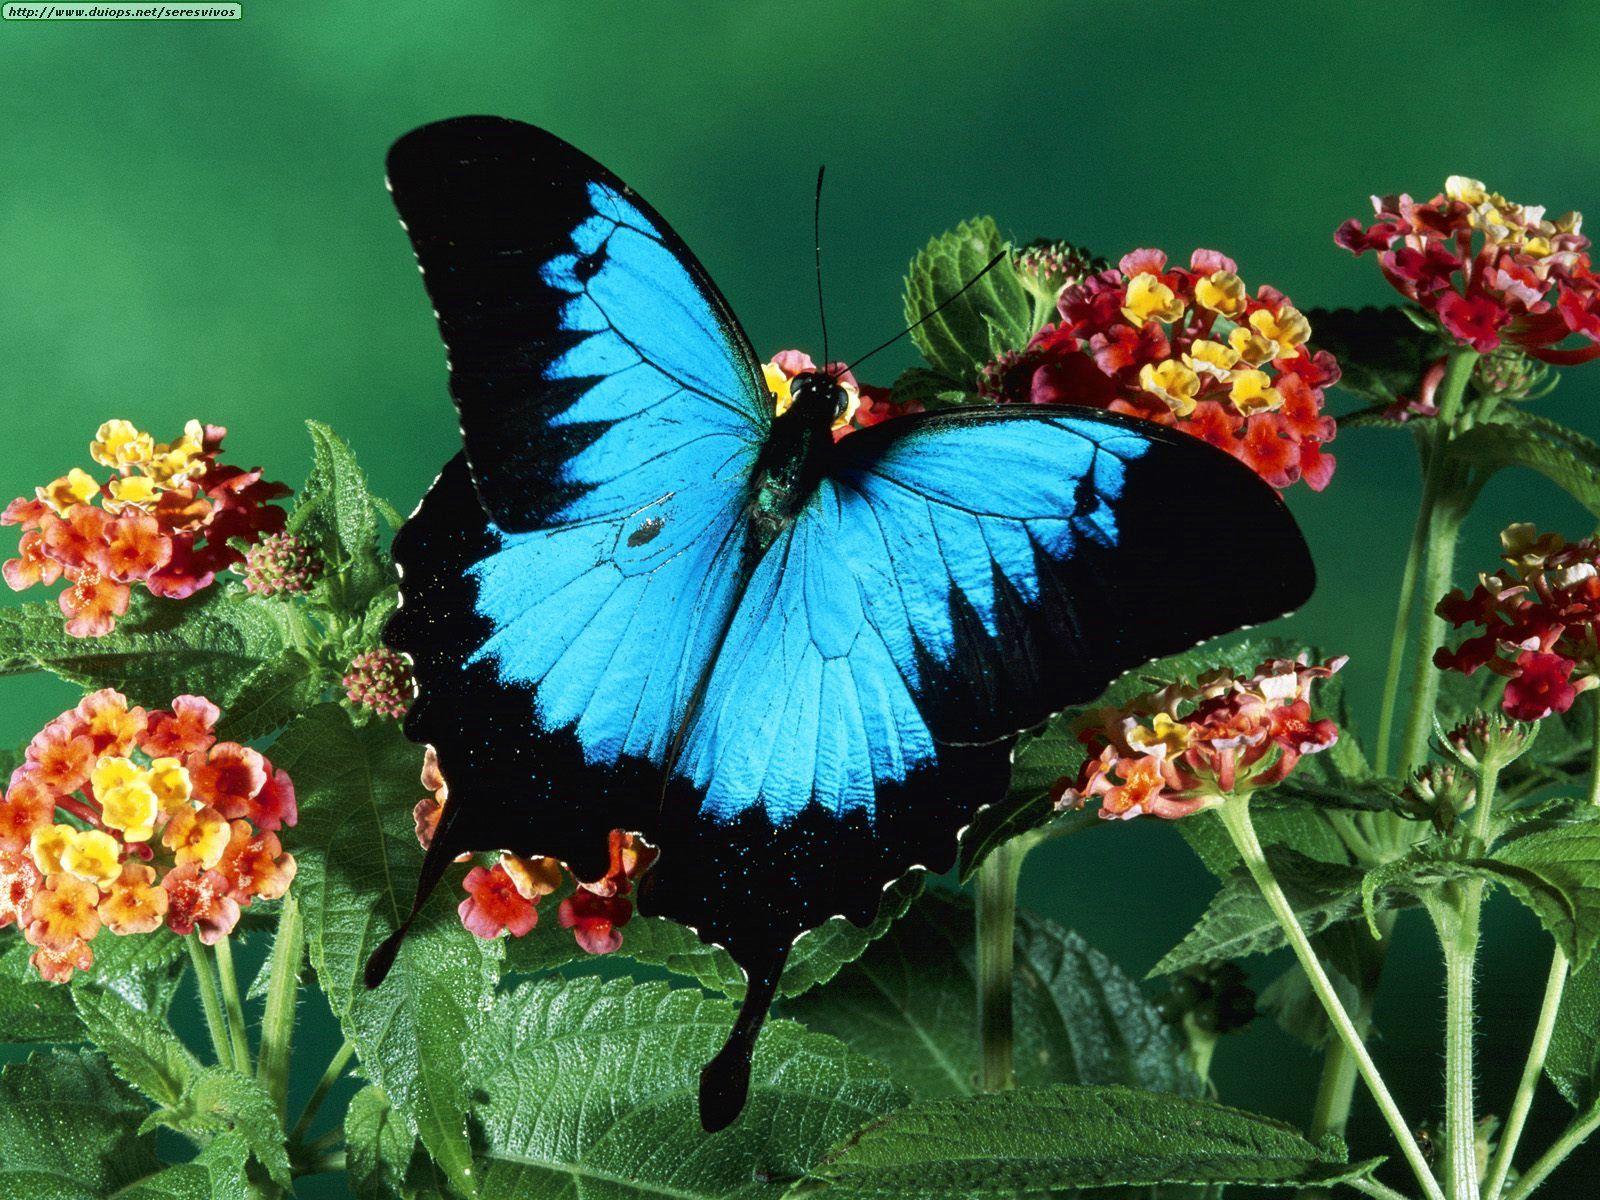 Ulysses Butterfly, Kuranda State Forest, Queensland, Australia.jpg (1600×1200)